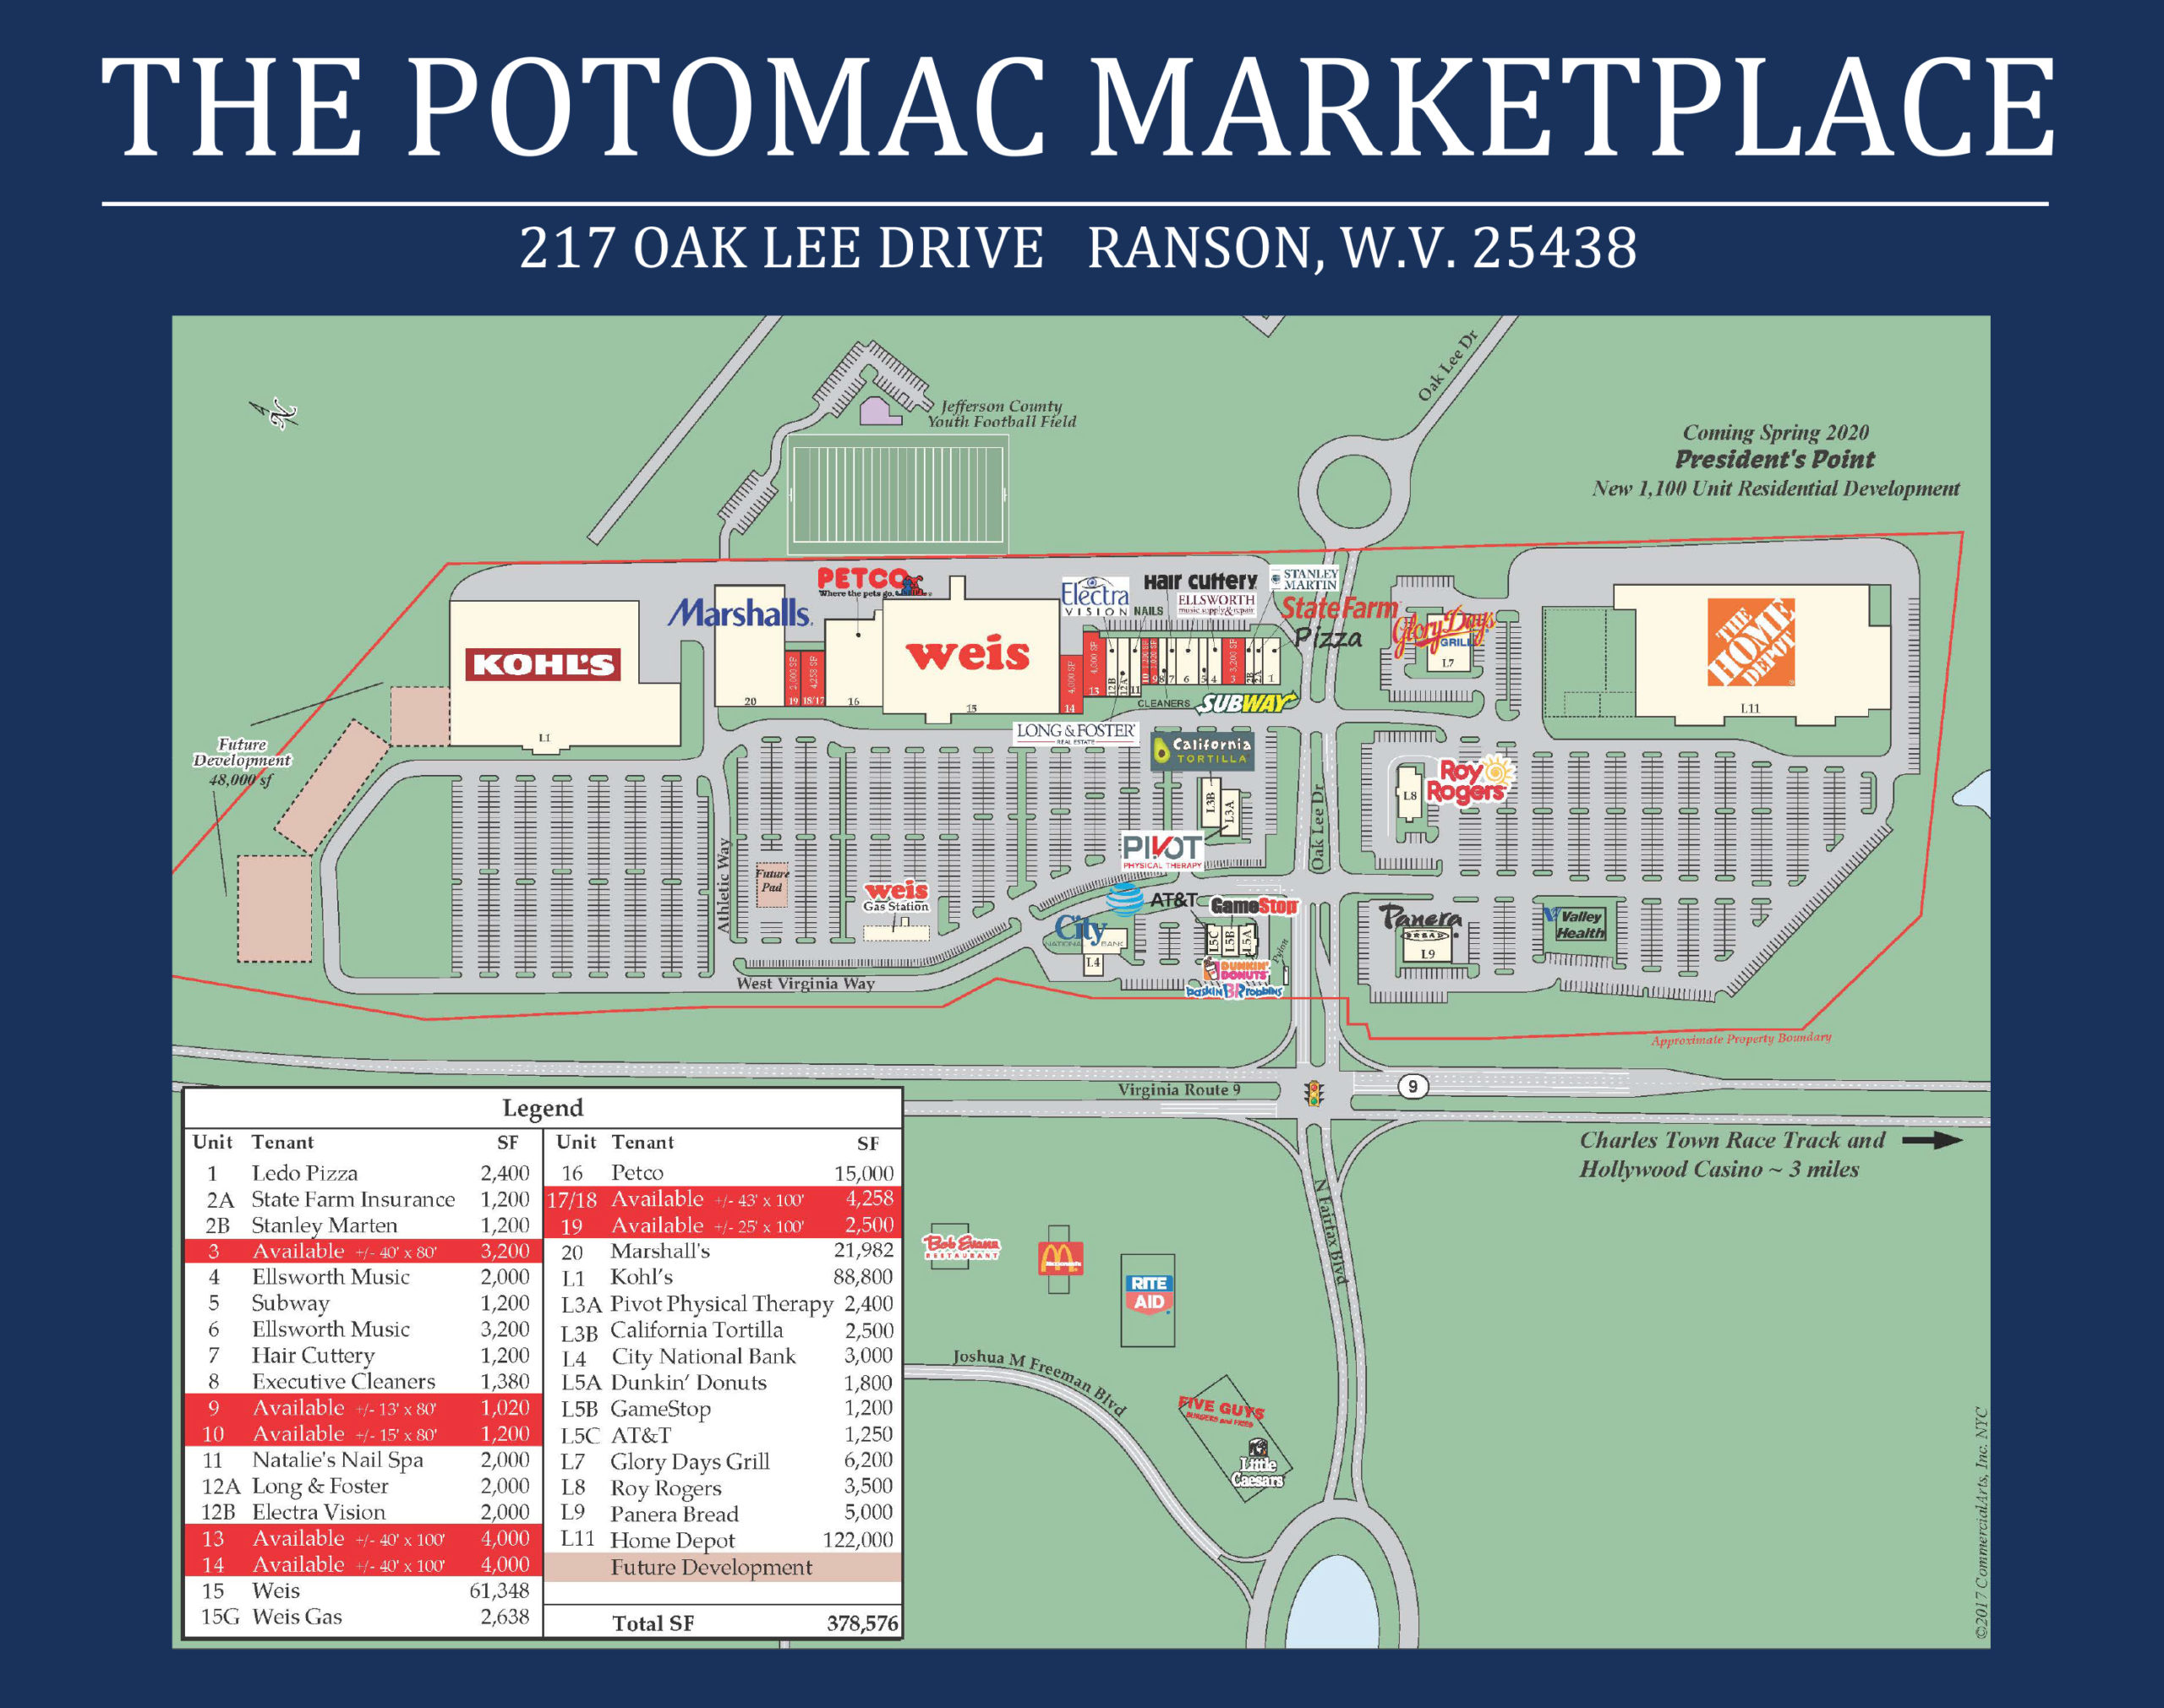 The Potomac Marketplace